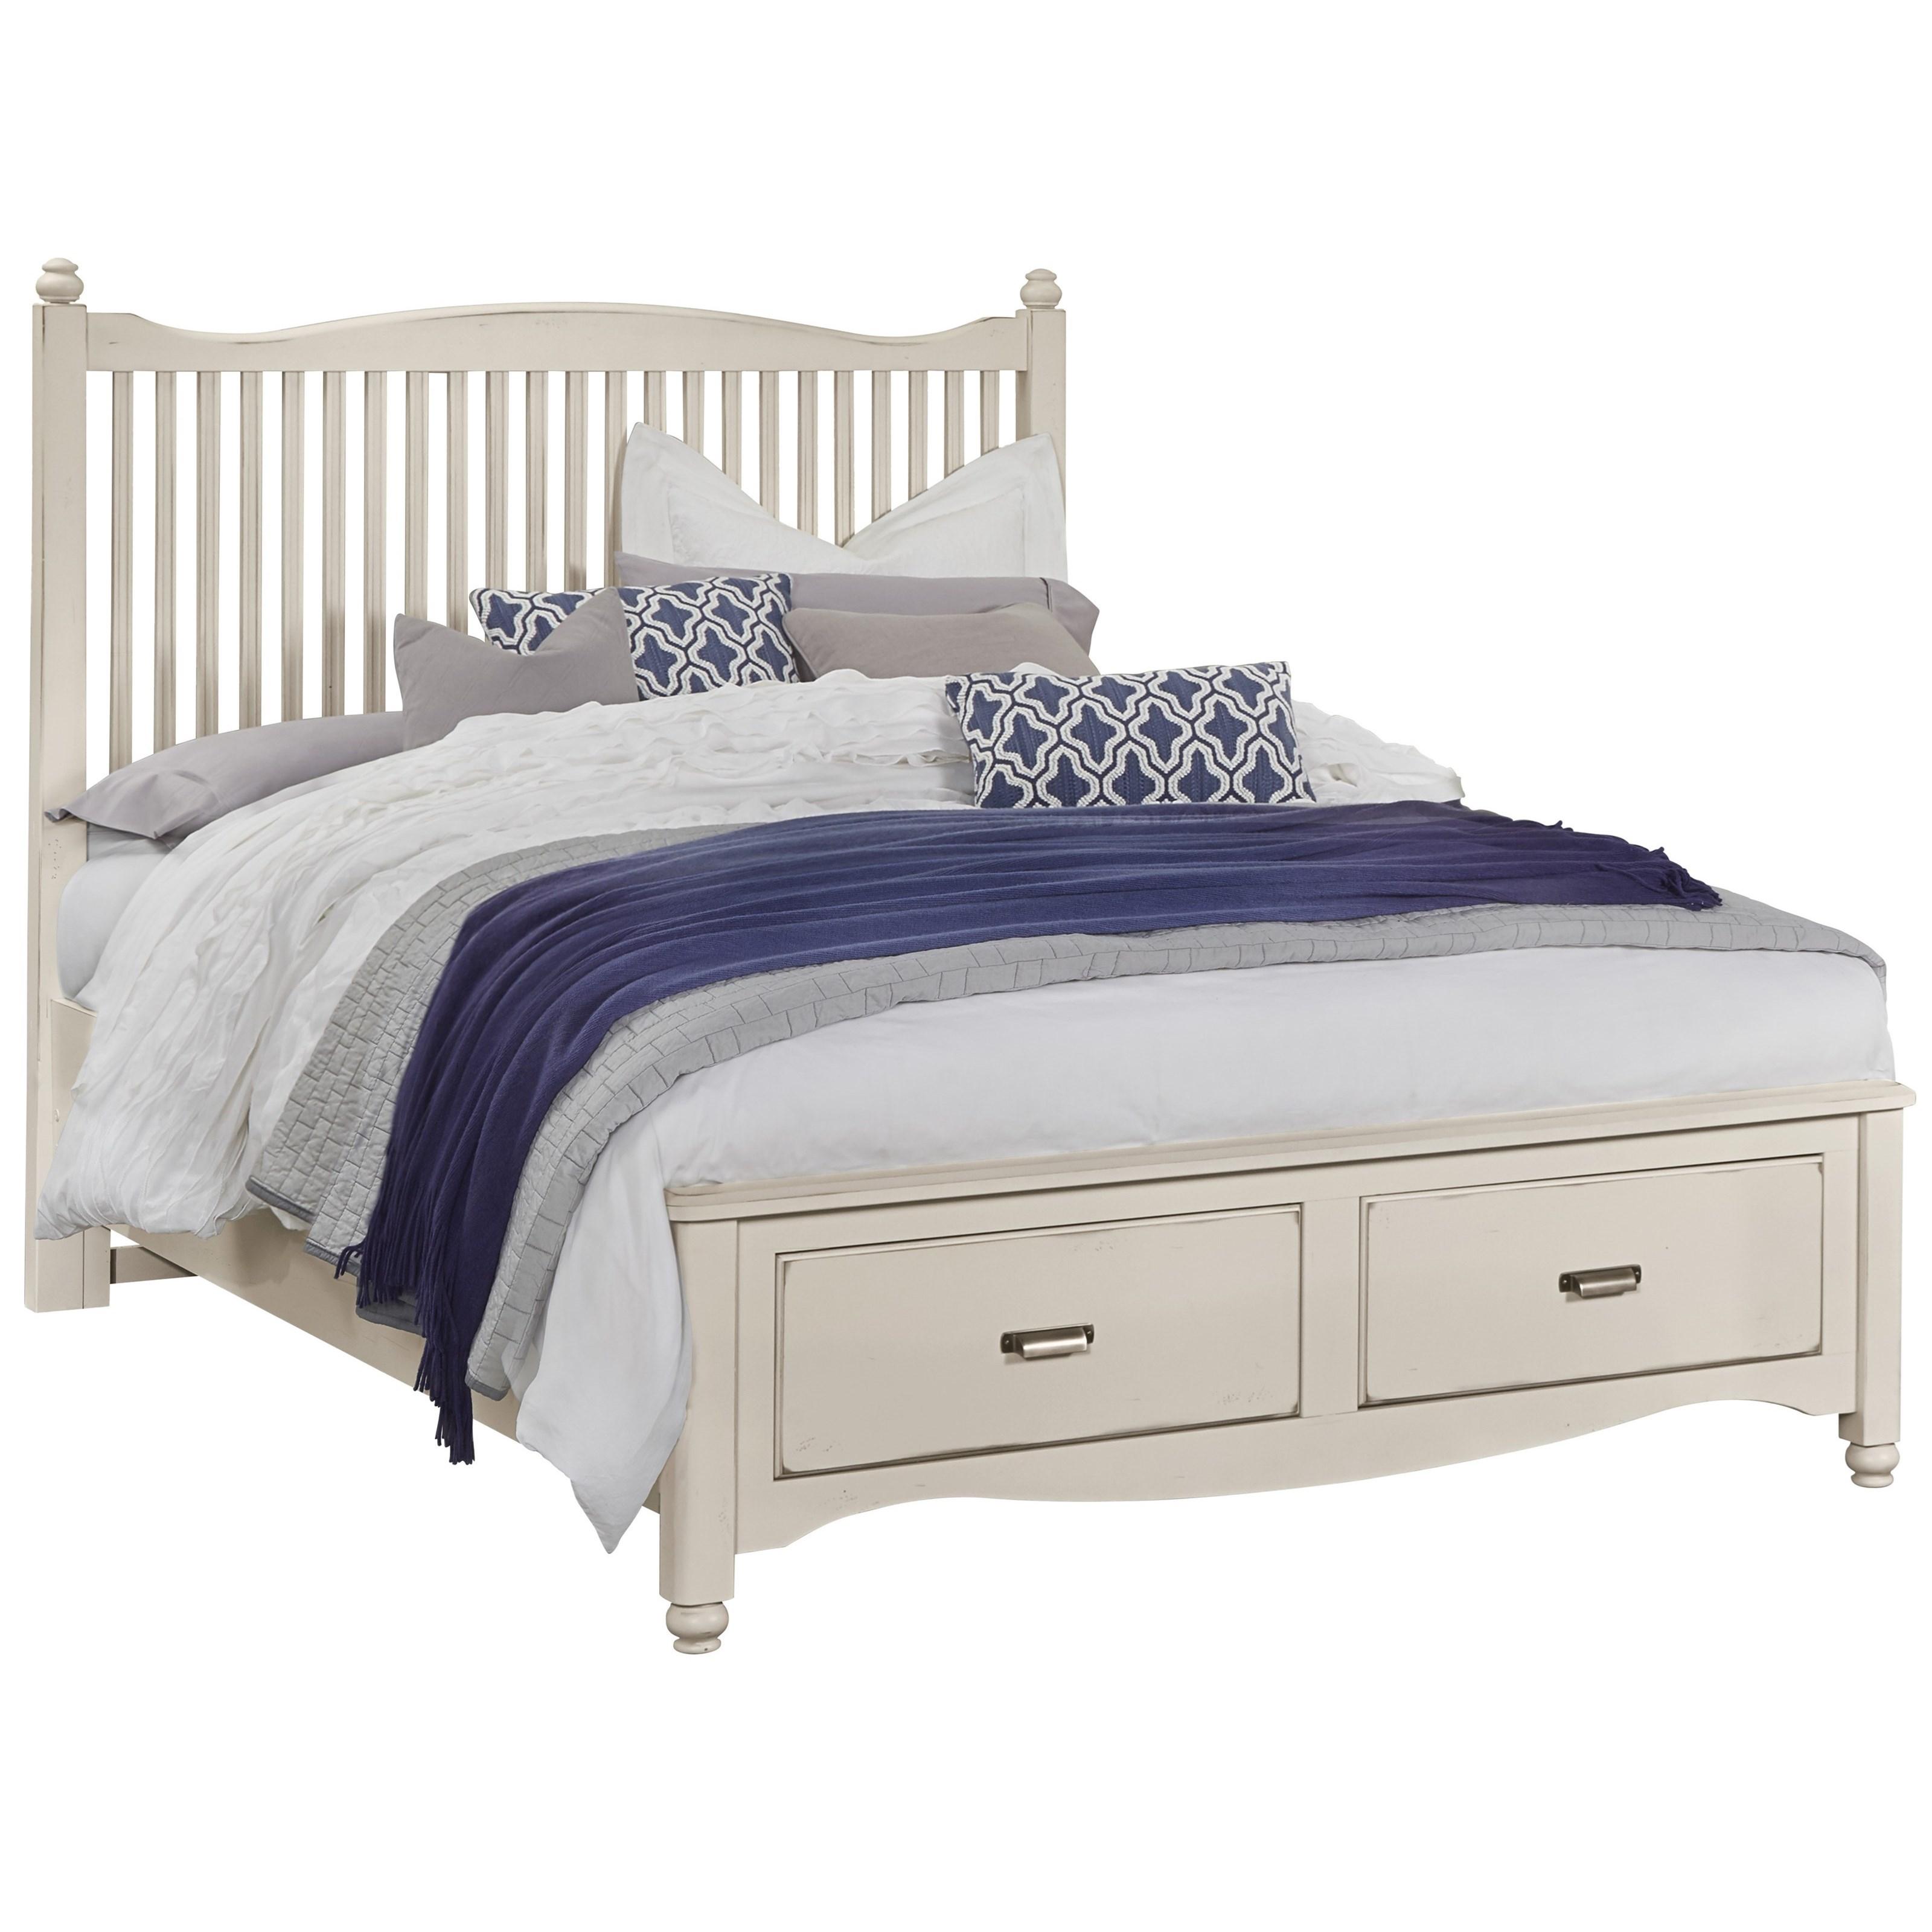 Vaughan Bassett American Maple Queen Slat Storage Bed - Item Number: 404-557+050B+502+555T